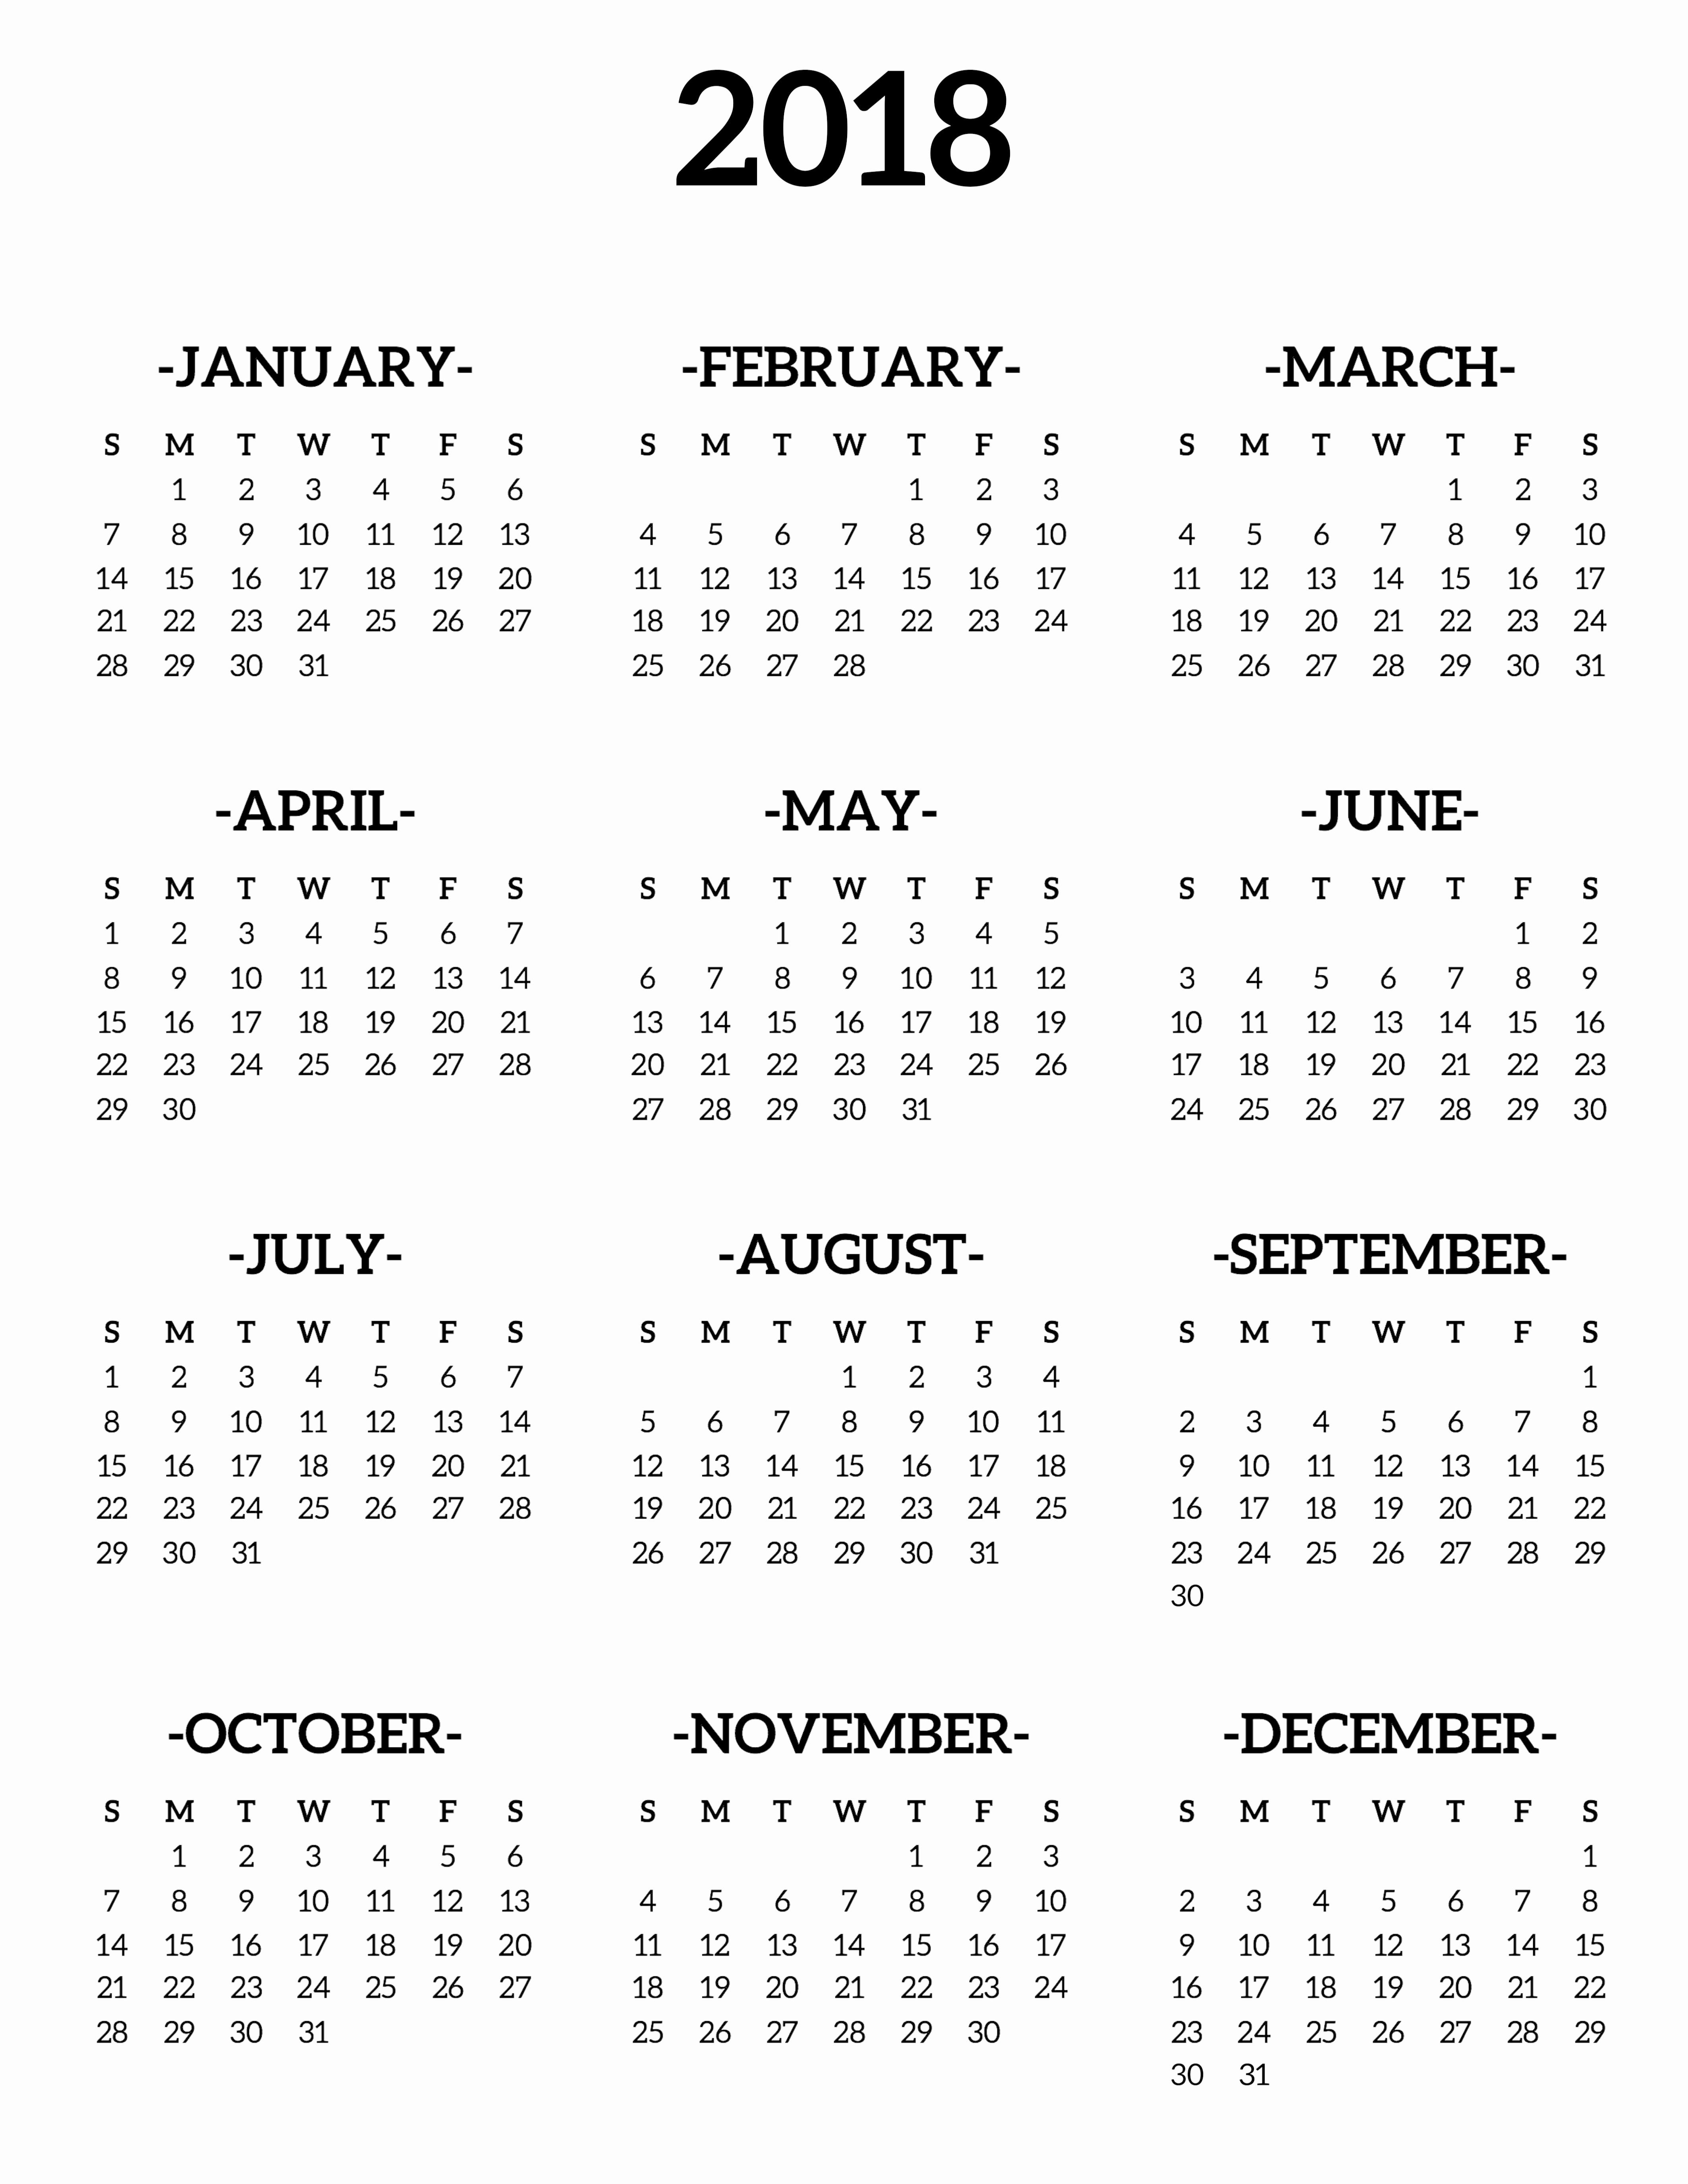 Free Printable 2018 Calendar Templates Beautiful Calendar 2018 Printable E Page Paper Trail Design